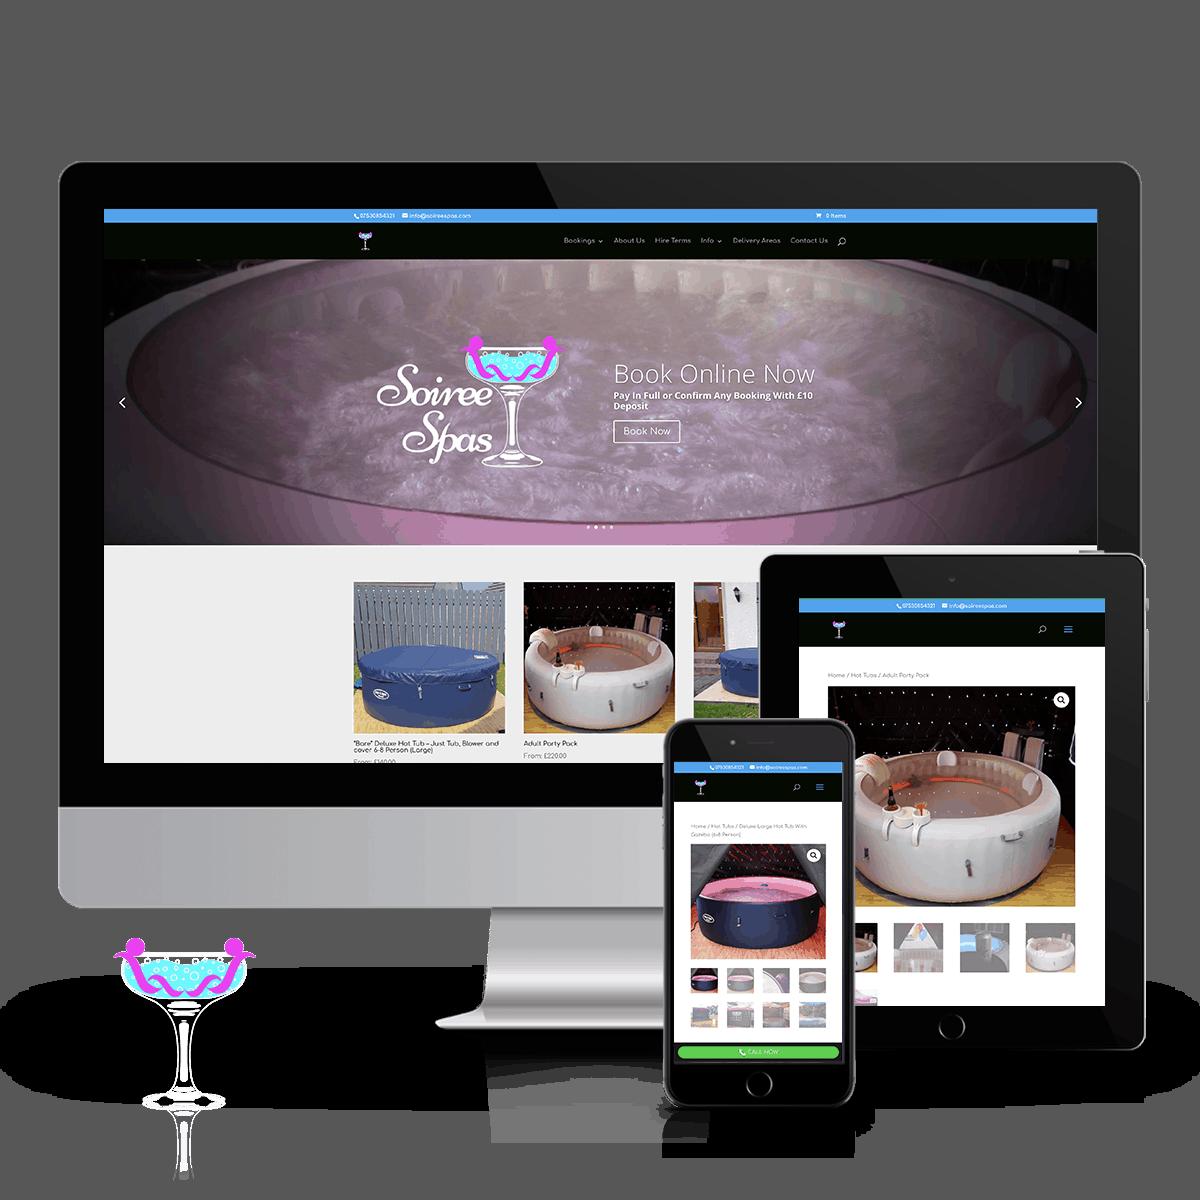 SoireeSpas hot tub booking website